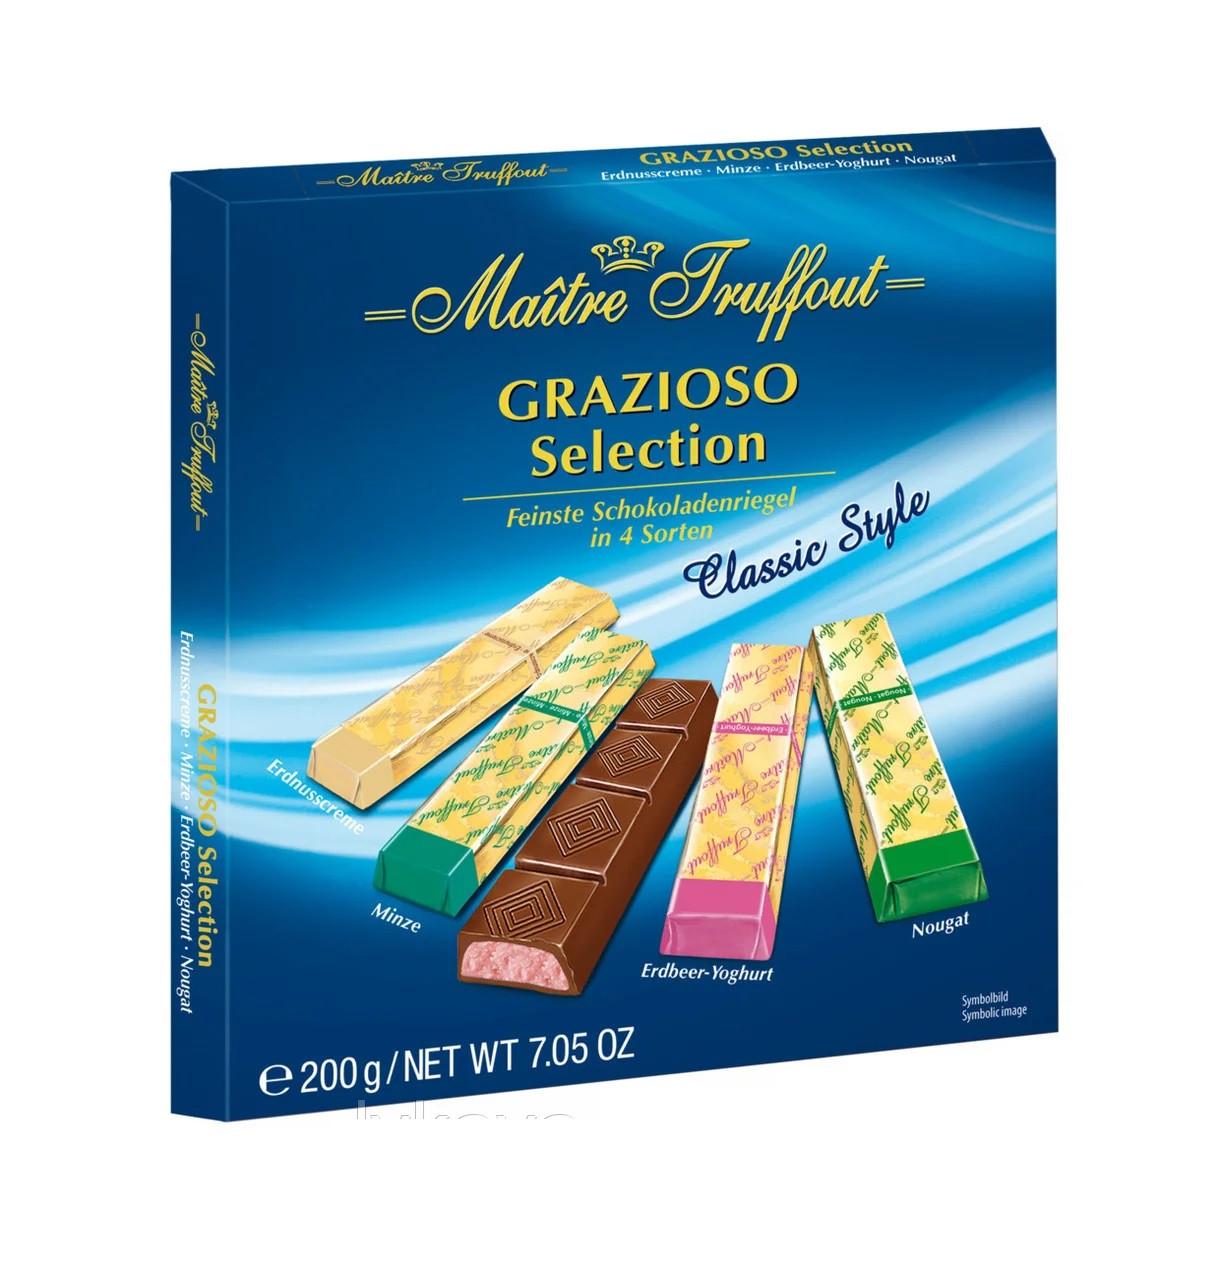 Шоколад черный и молочный Grazioso Selection Classic style Maitre Truffout 200 г Австрия